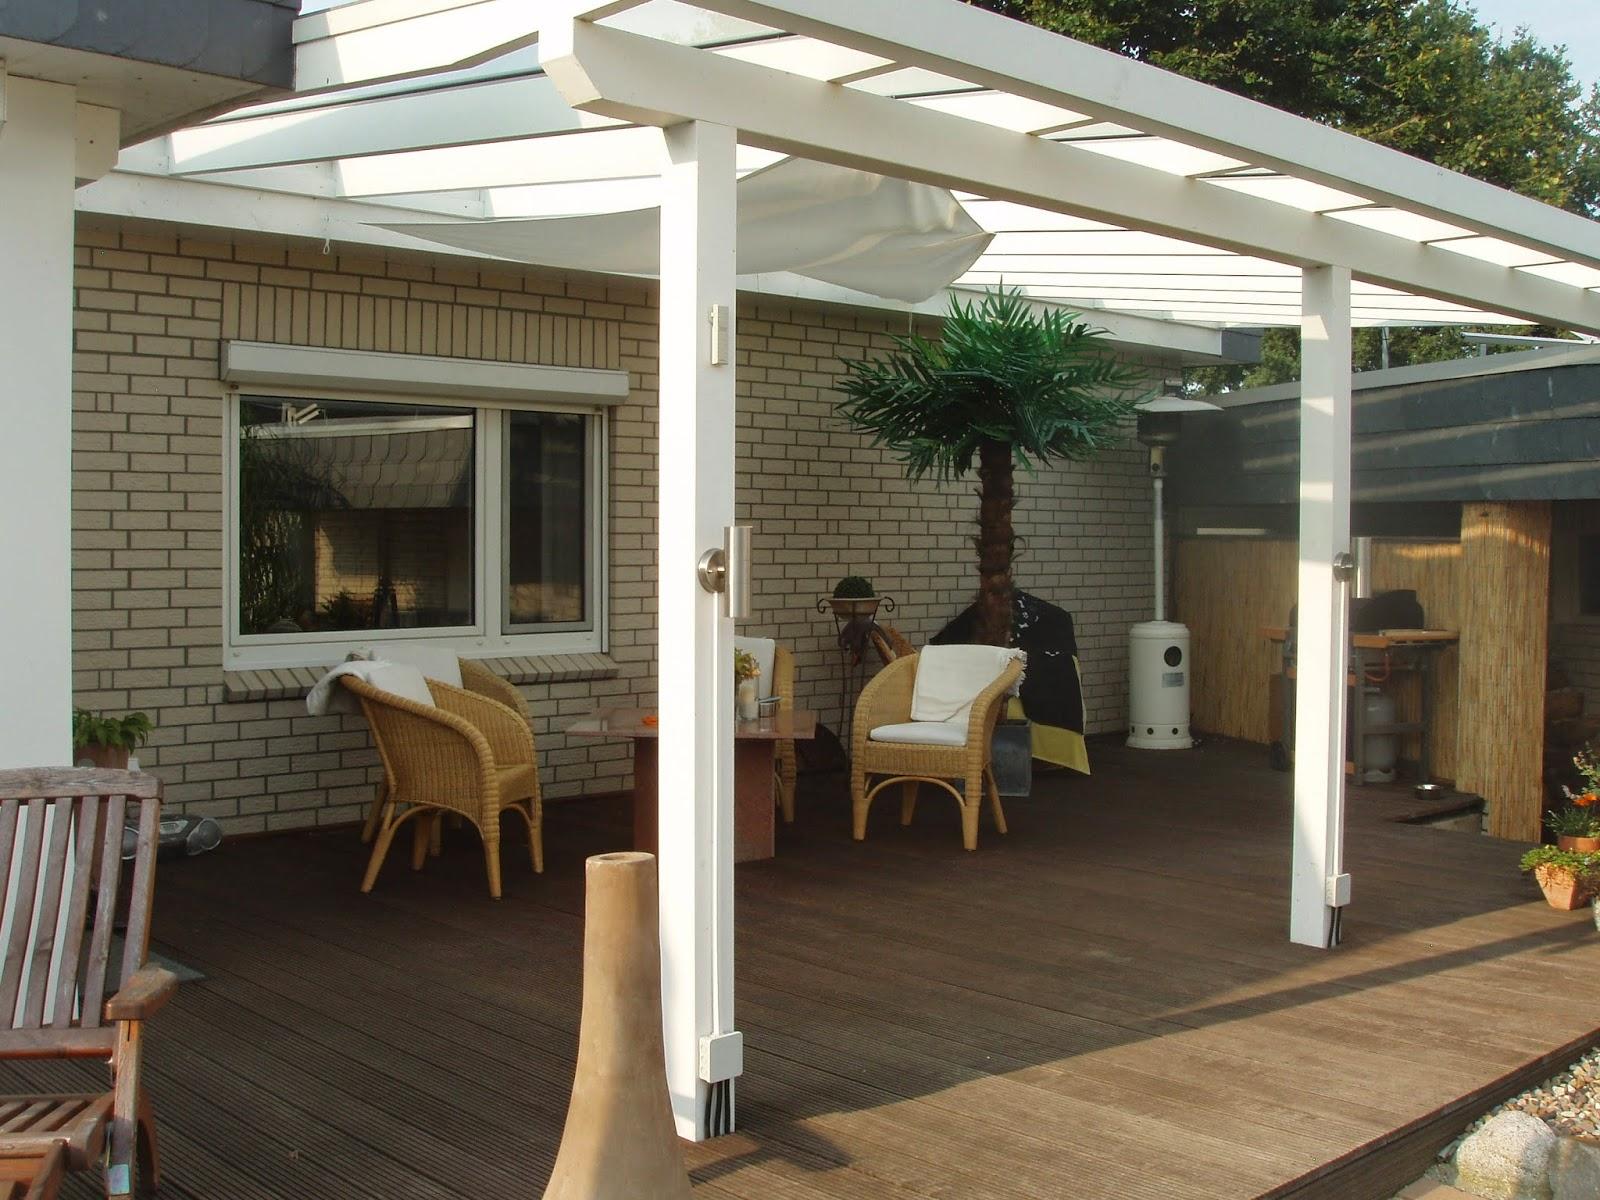 Windschutz Für Terrassenüberdachung : Terrassen u00fcberdachungen mit Glasdach W u00e4rmed u00e4mmung